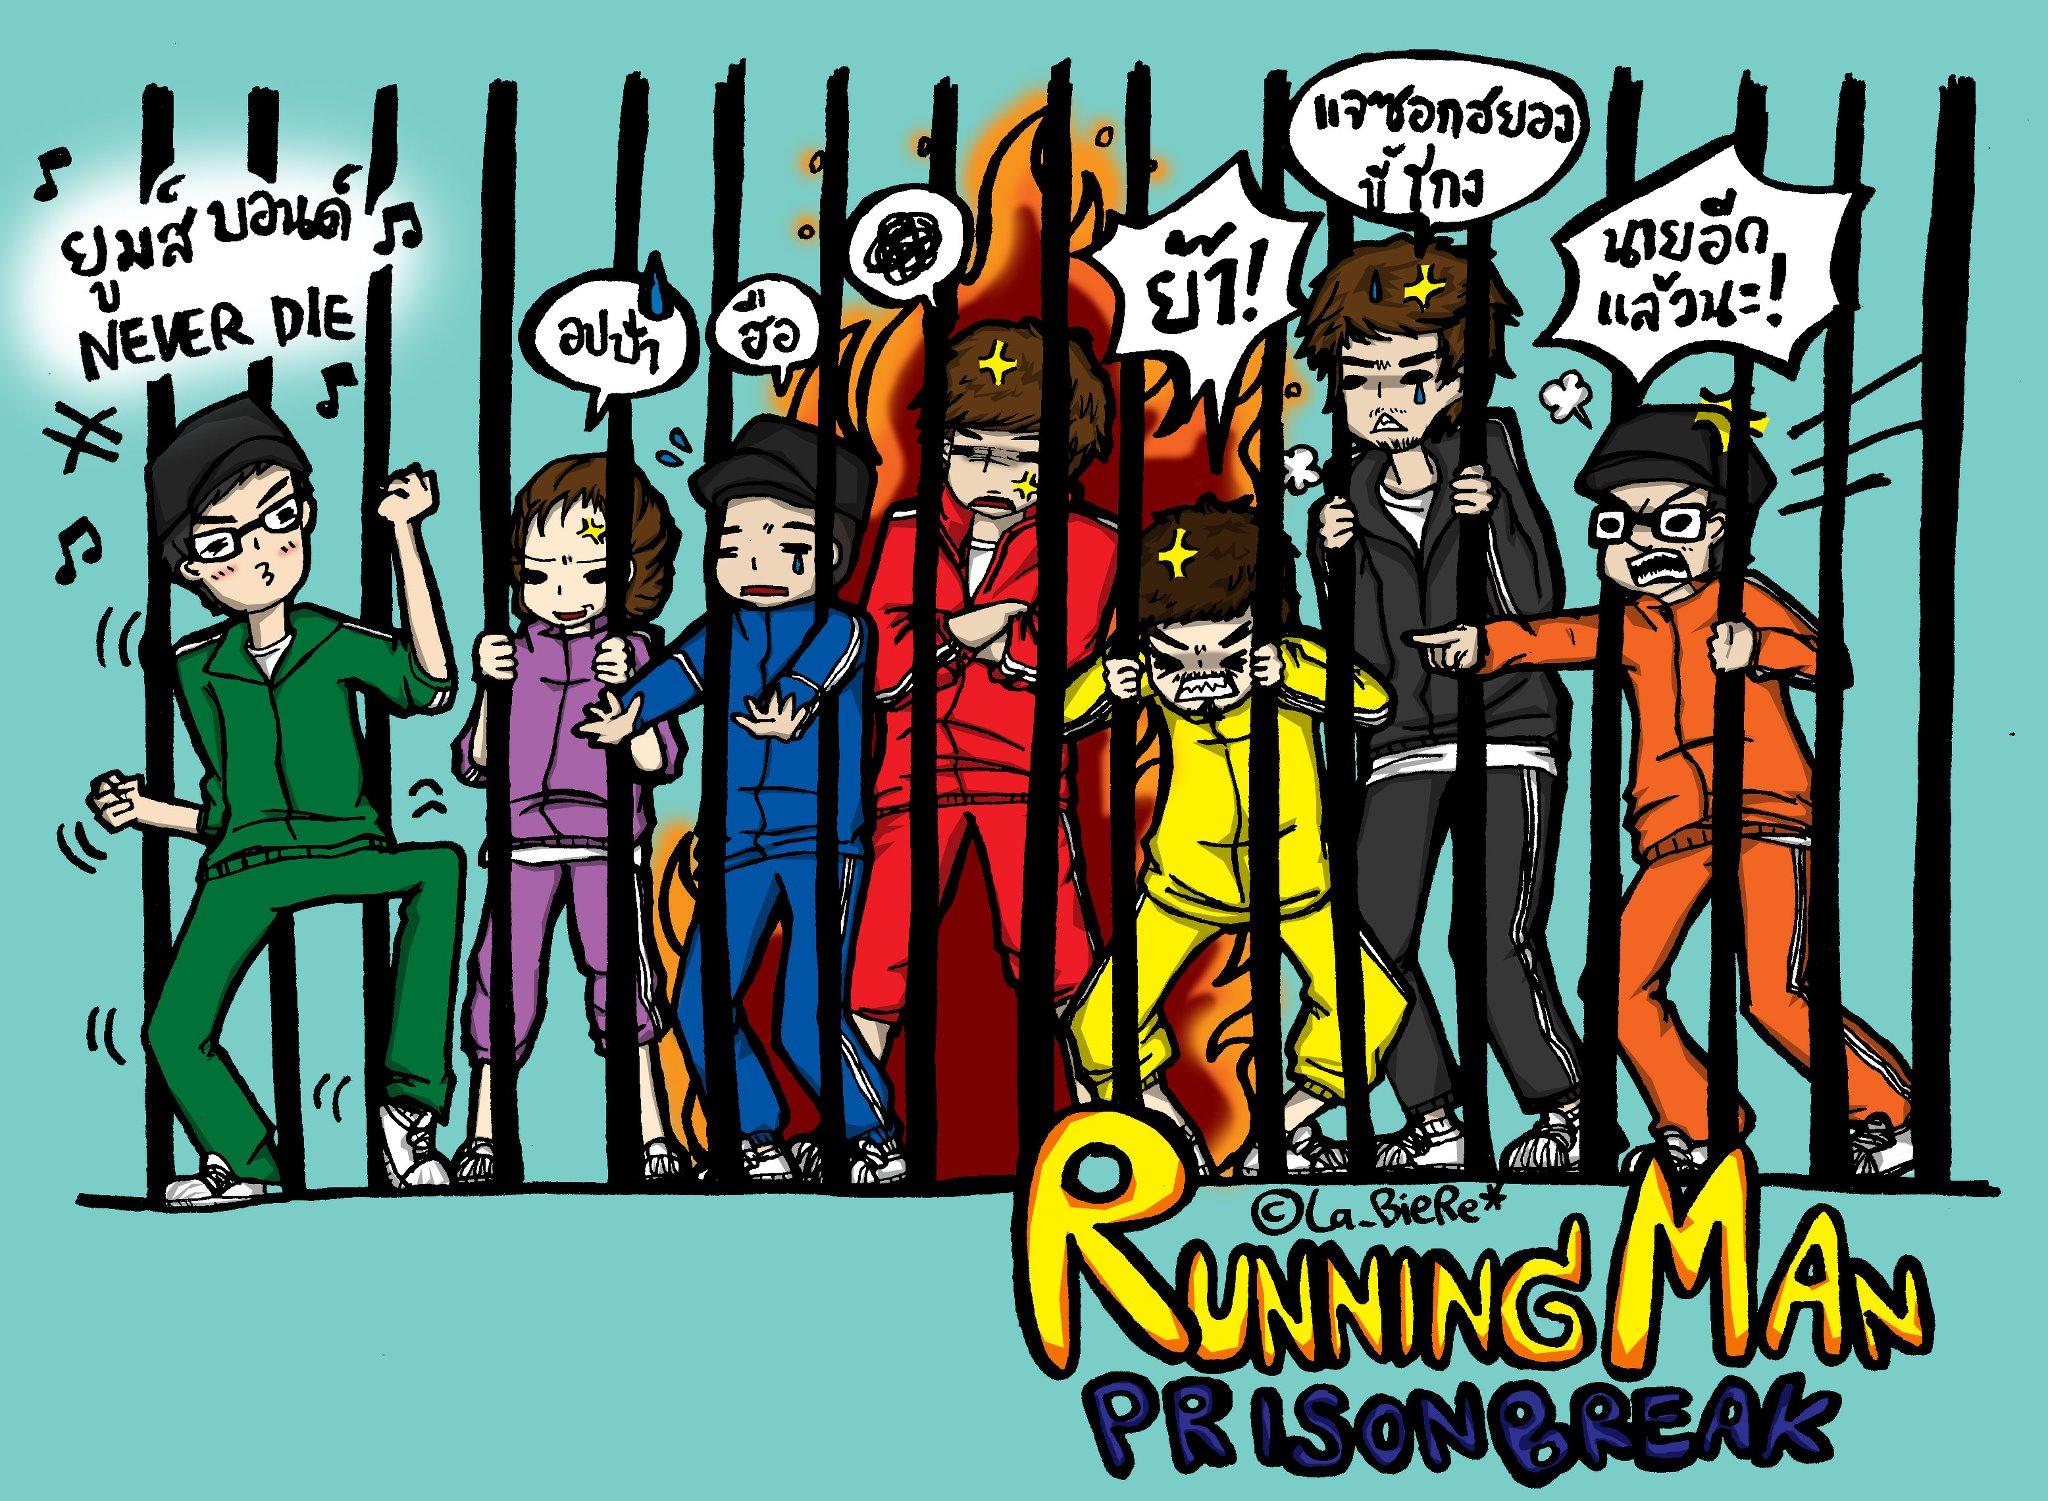 Image of: Jae Suk Running Man Images Running Man Cartoon Hd Wallpaper And Background Photos Nonuple Running Man Images Running Man Cartoon Hd Wallpaper And Background